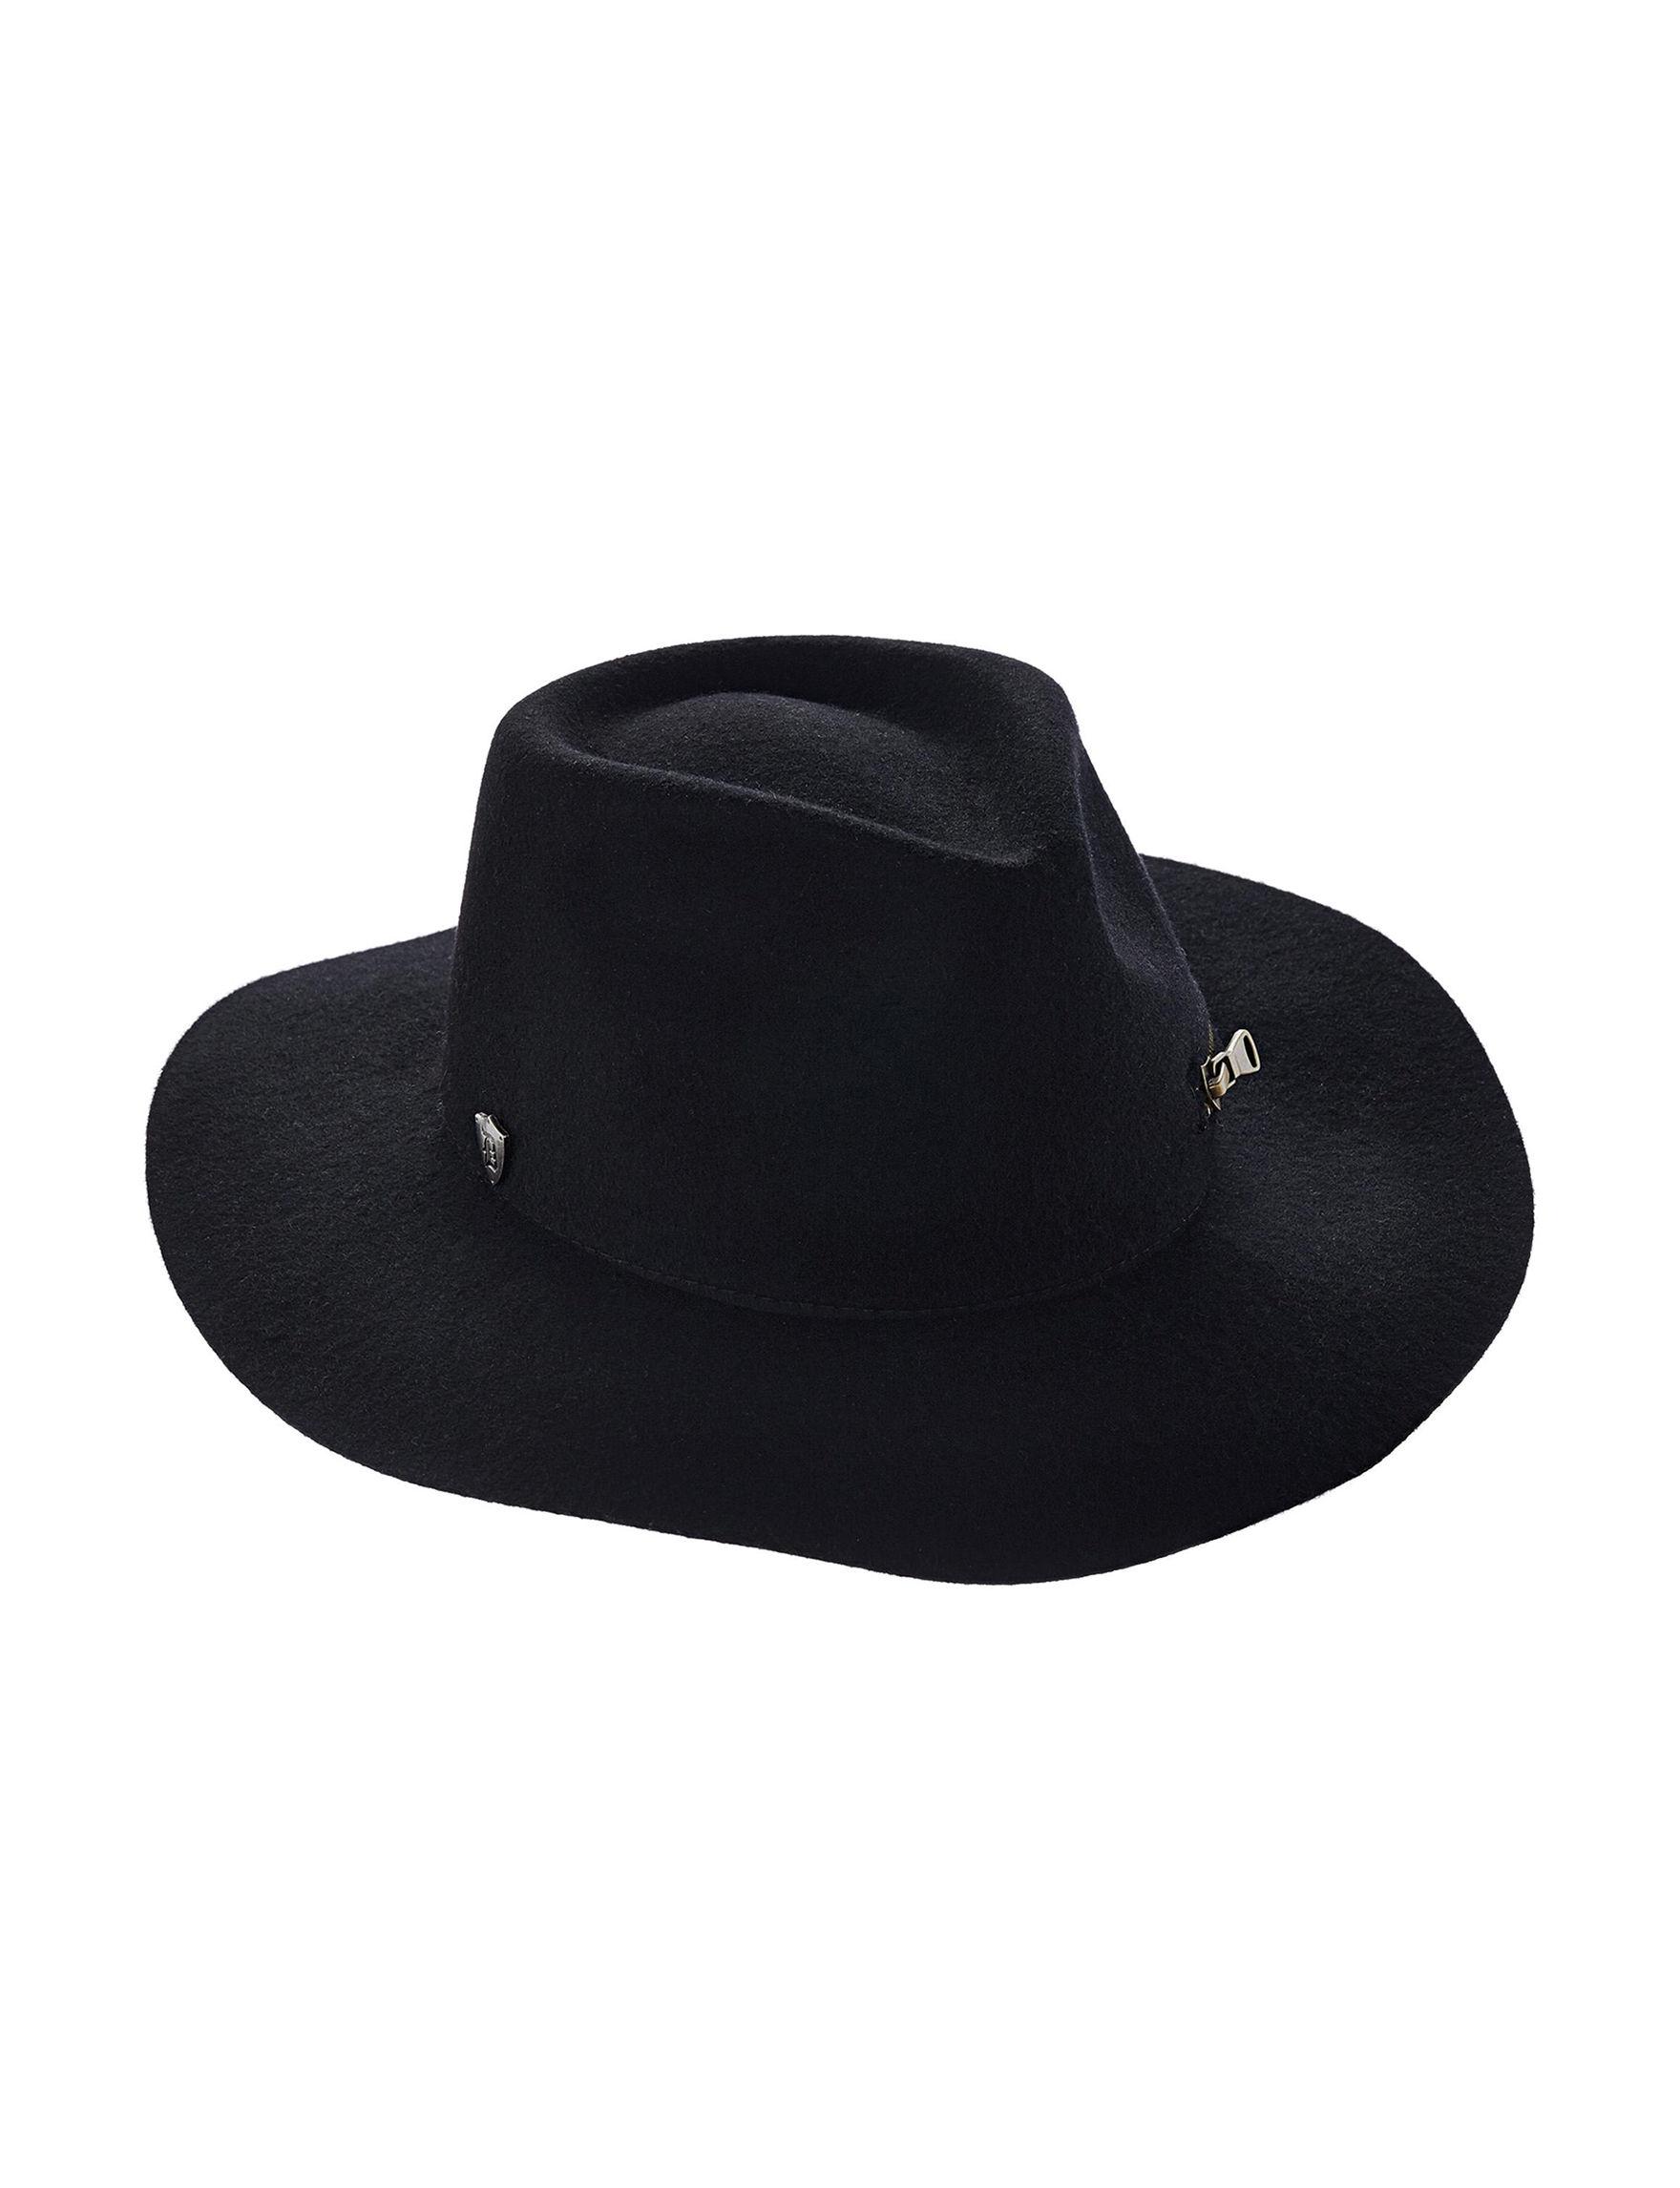 Callanan Black Hats & Headwear